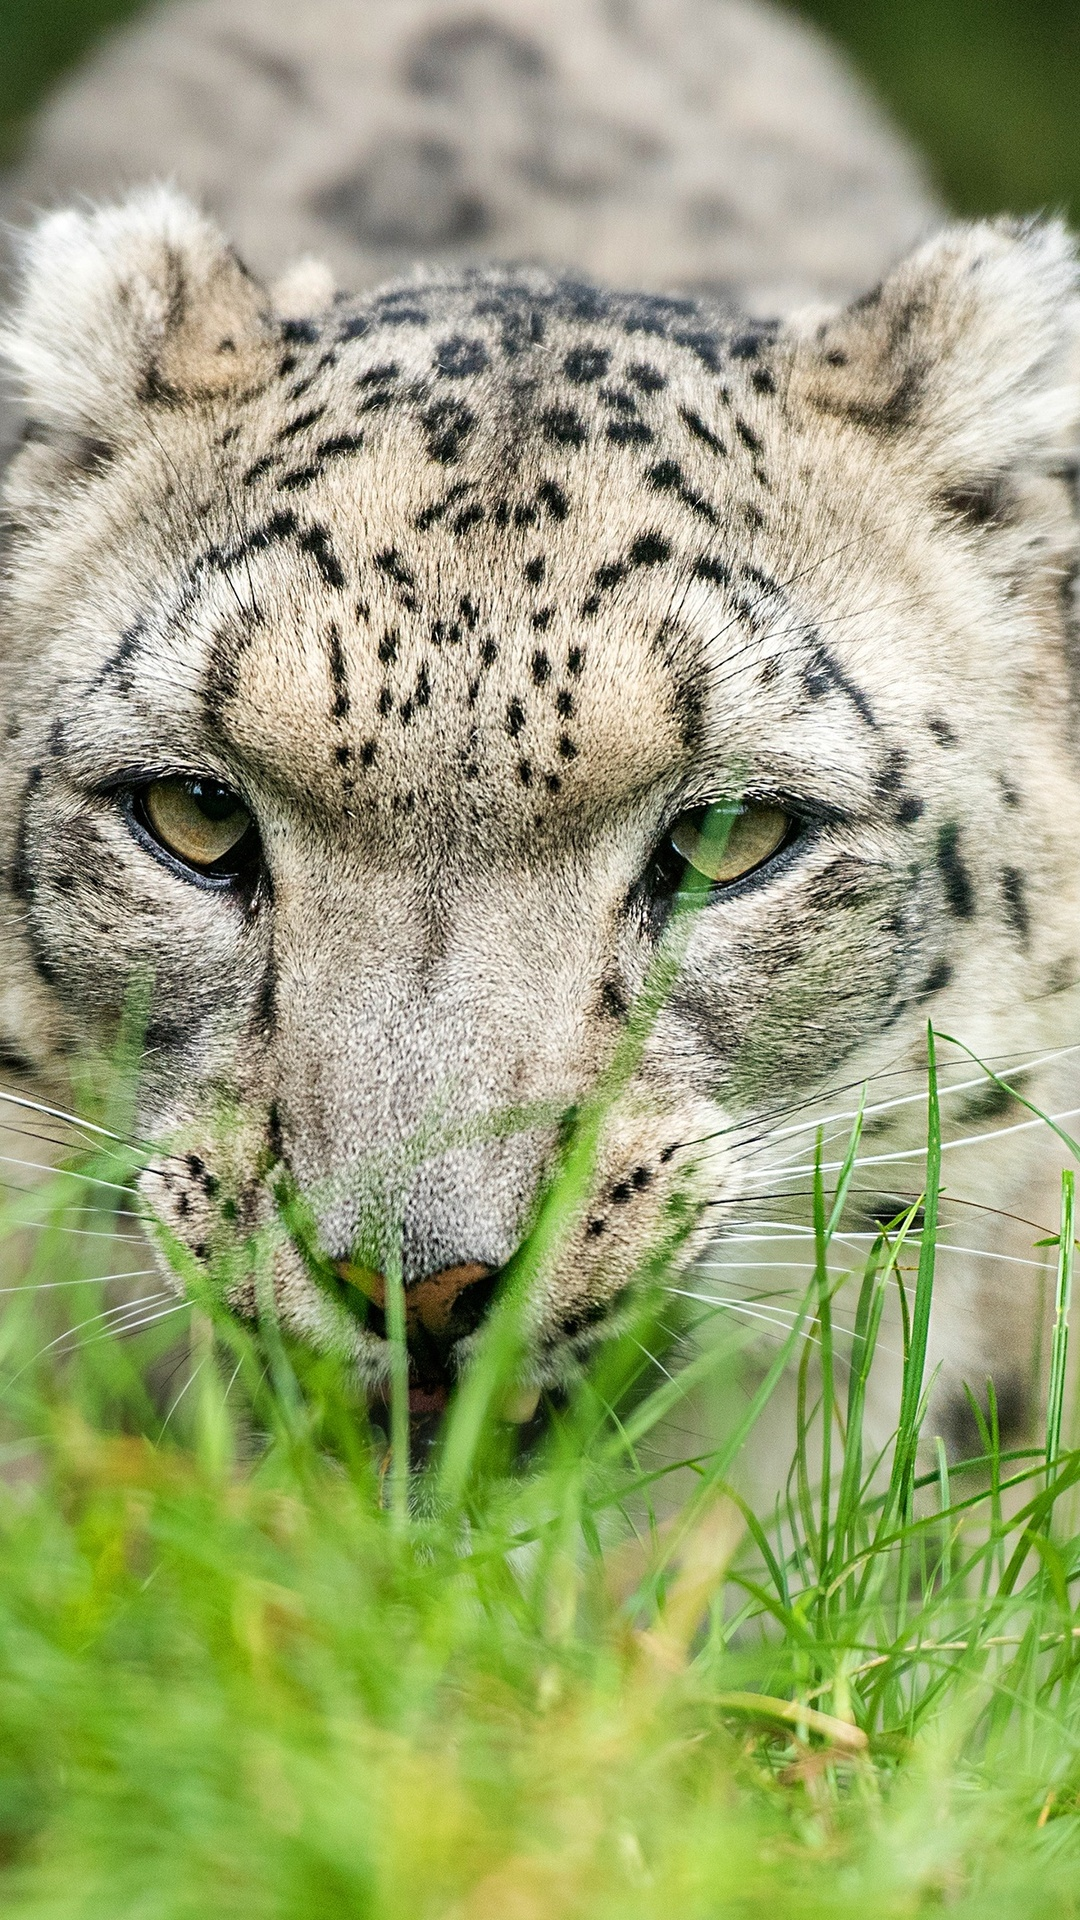 snow-leopard-glance-4k-85.jpg